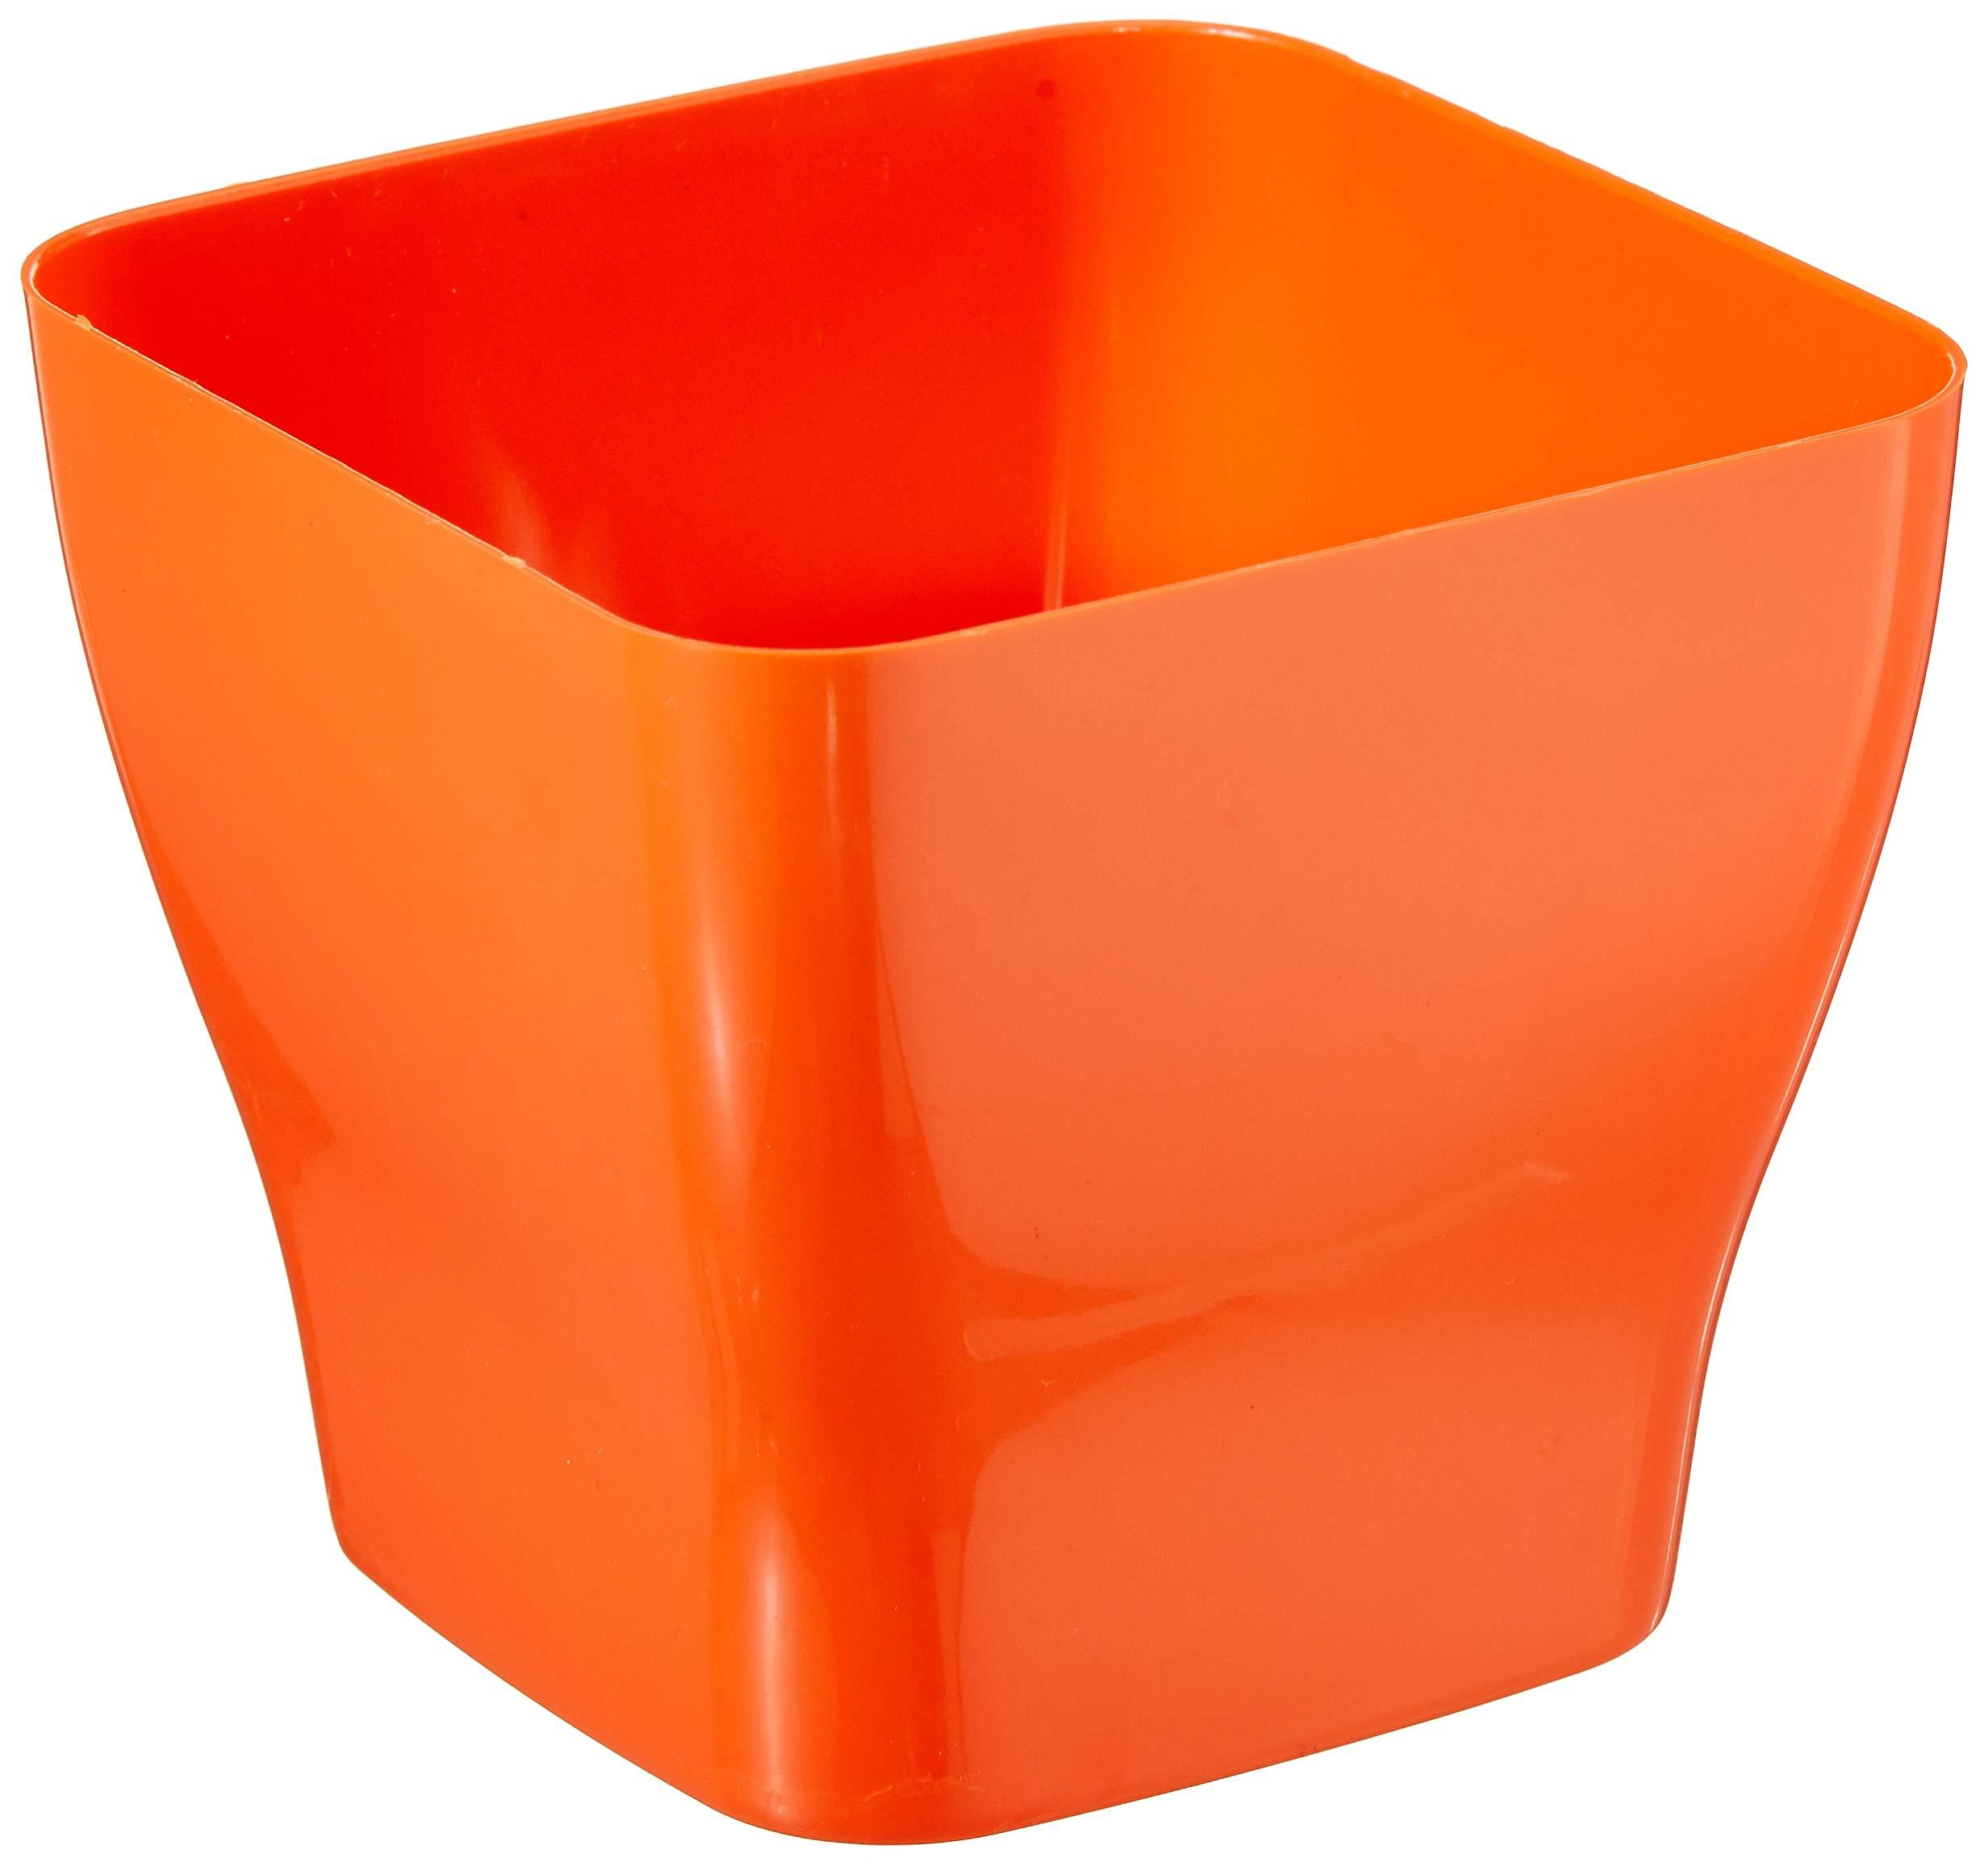 Klassic Plastic Table Top Square Pot Set (Orange, Pack of 4) (B07MSB4Y2M) Amazon Price History, Amazon Price Tracker